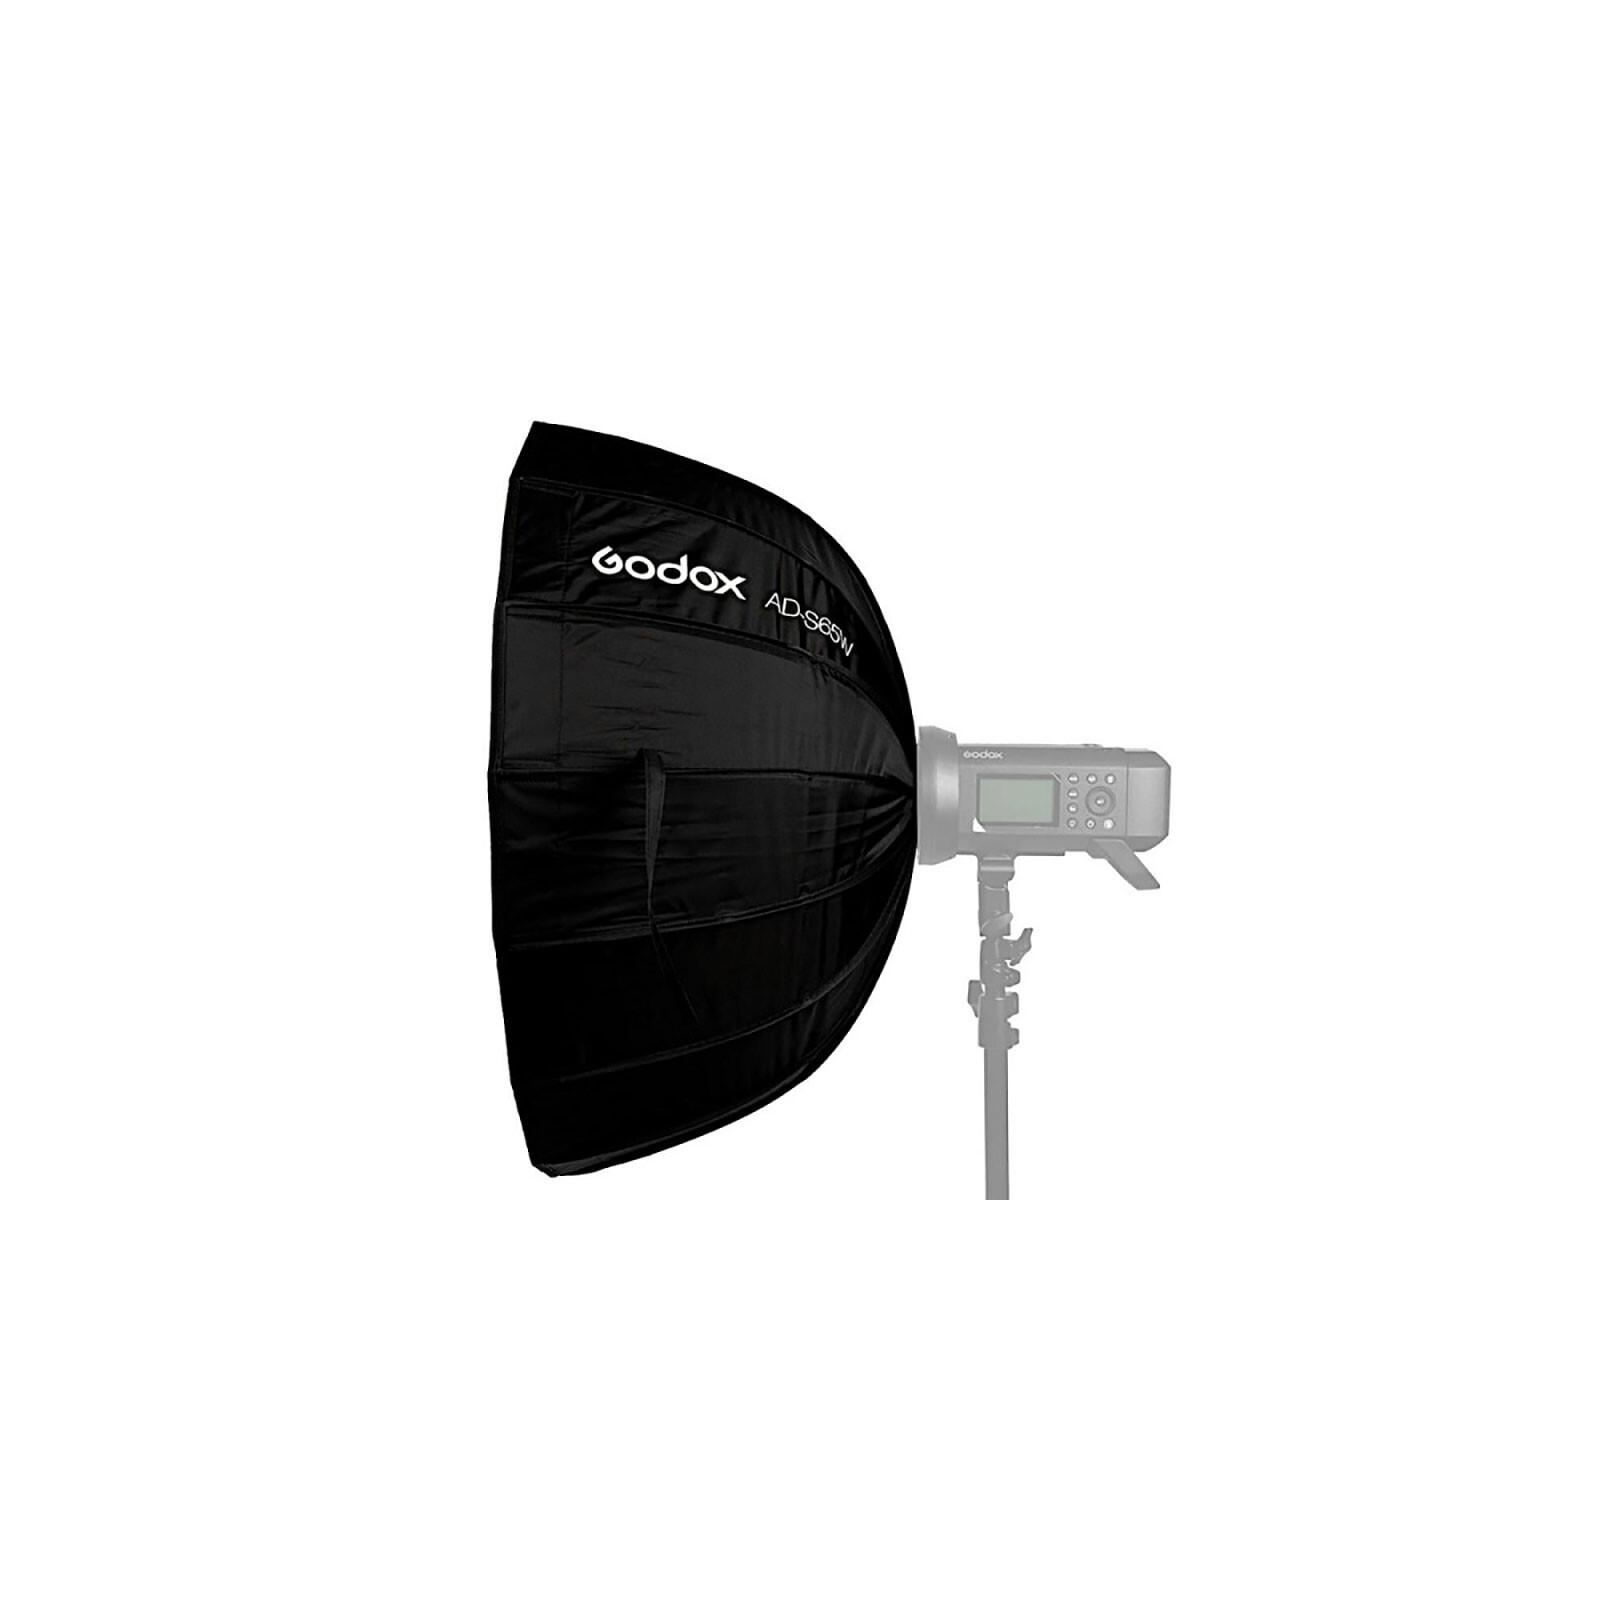 GODOX Softbox white 65cm für AD400PRO